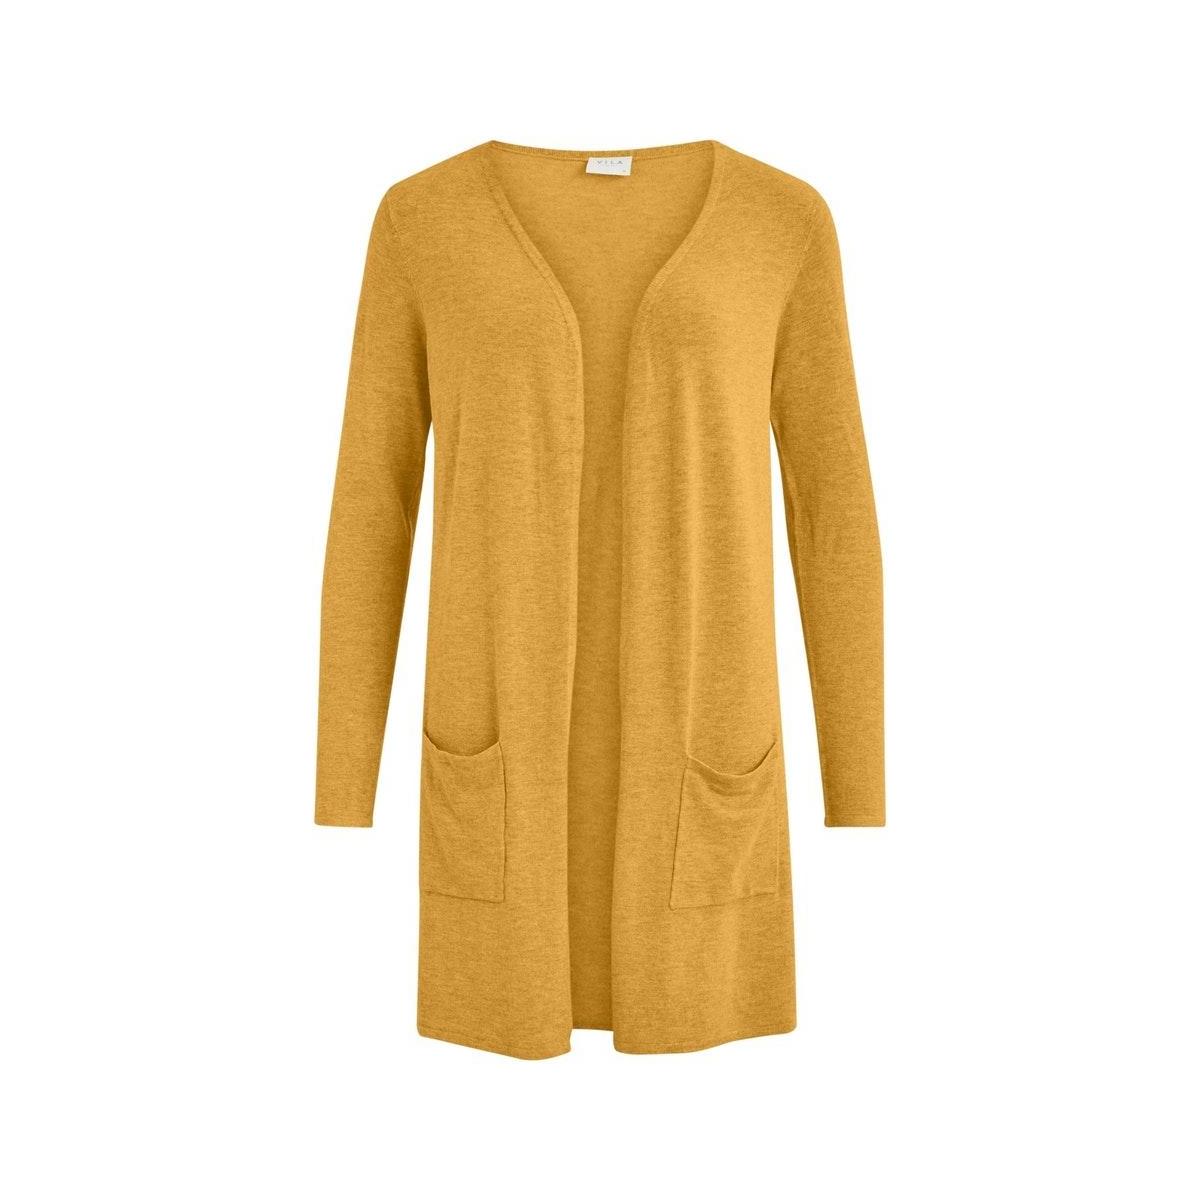 vibolonsia knit pocket l/s cardigan 14058240 vila vest mineral yellow